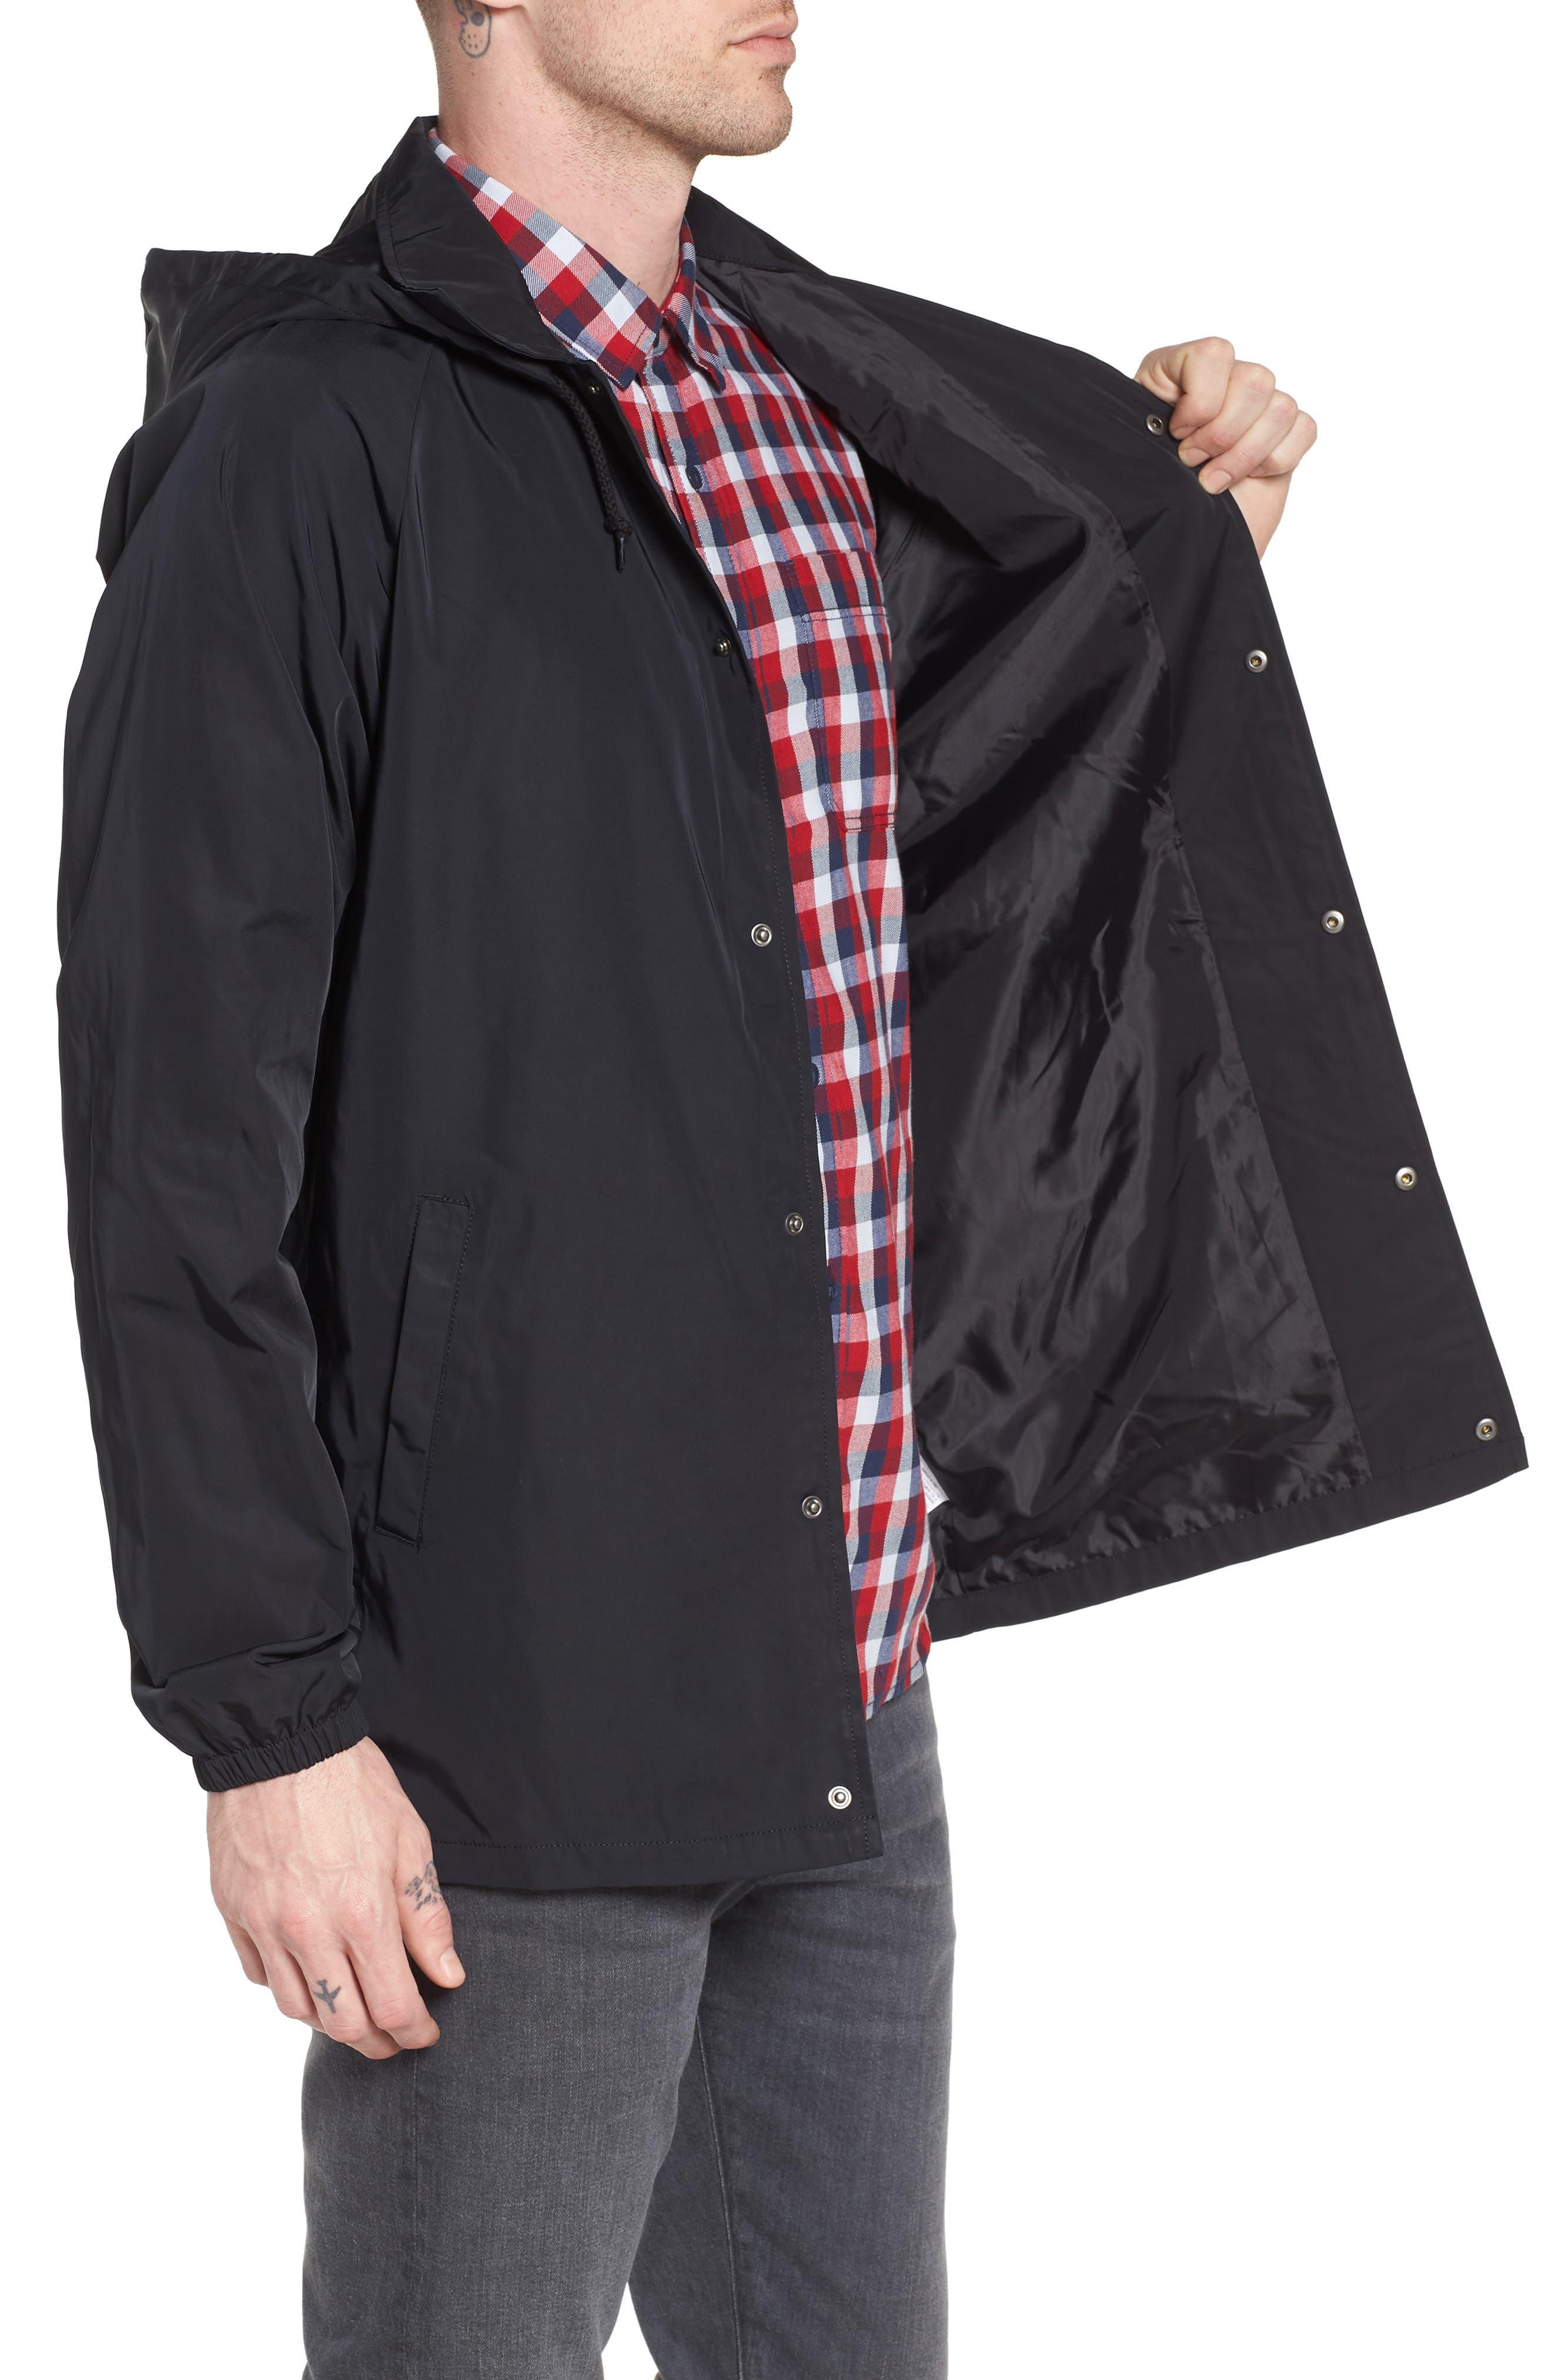 Torrey Water-Resistant Hooded Jacket,                             Alternate thumbnail 3, color,                             001